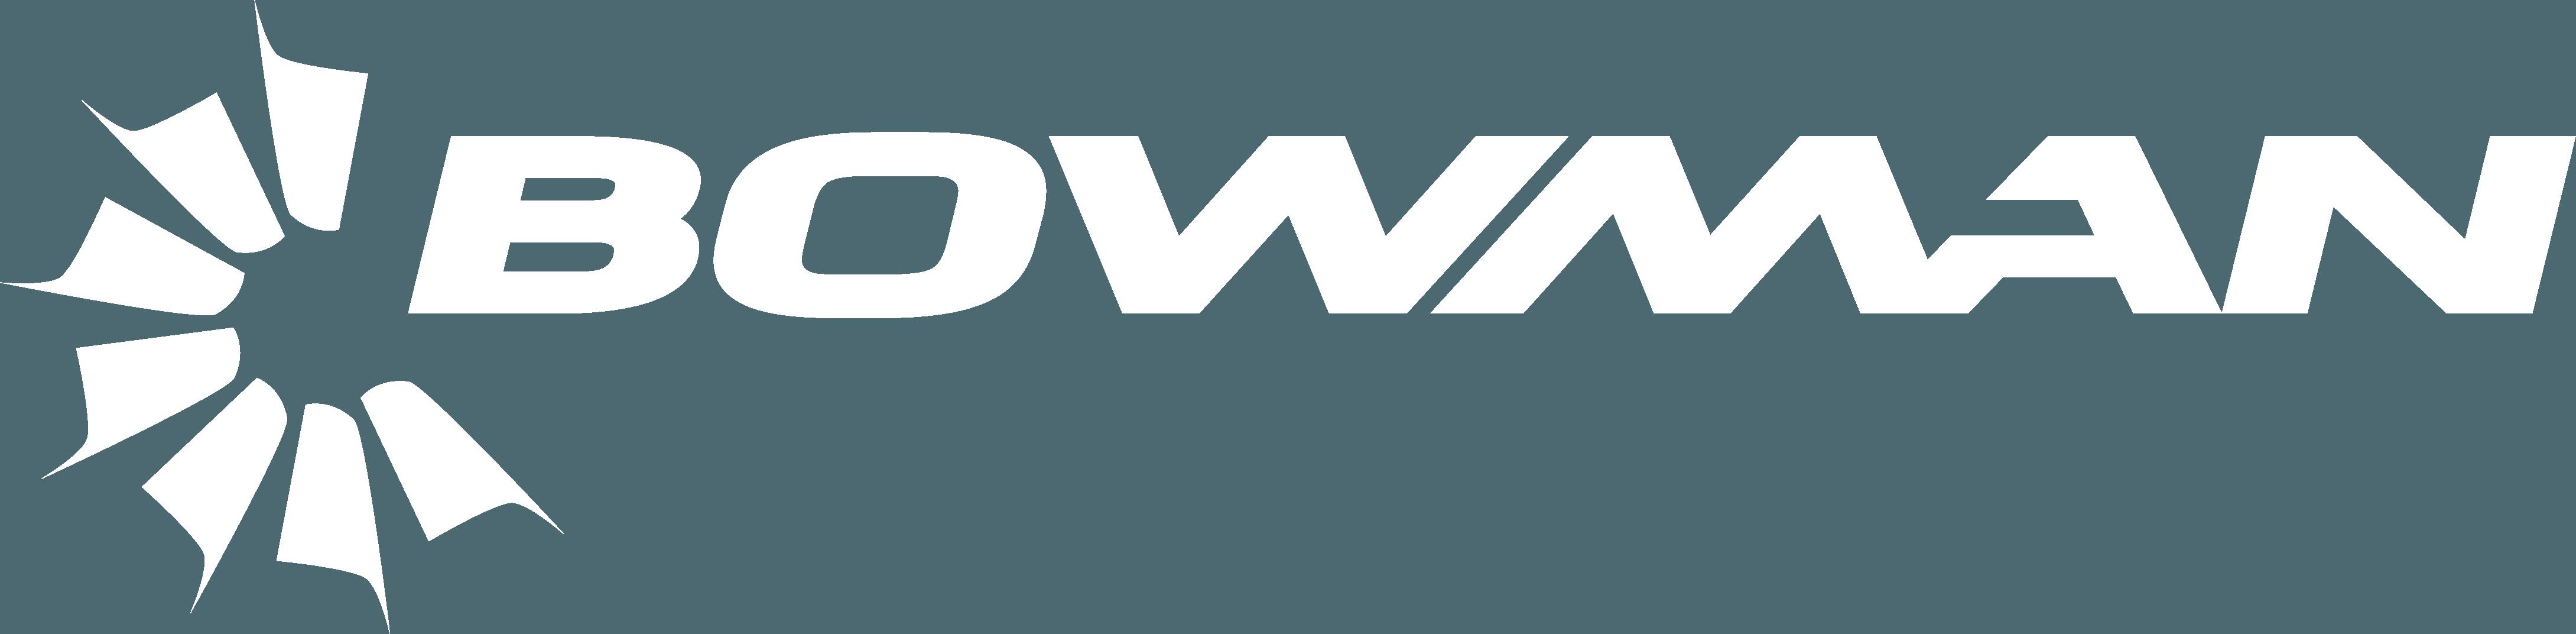 Bowman Power